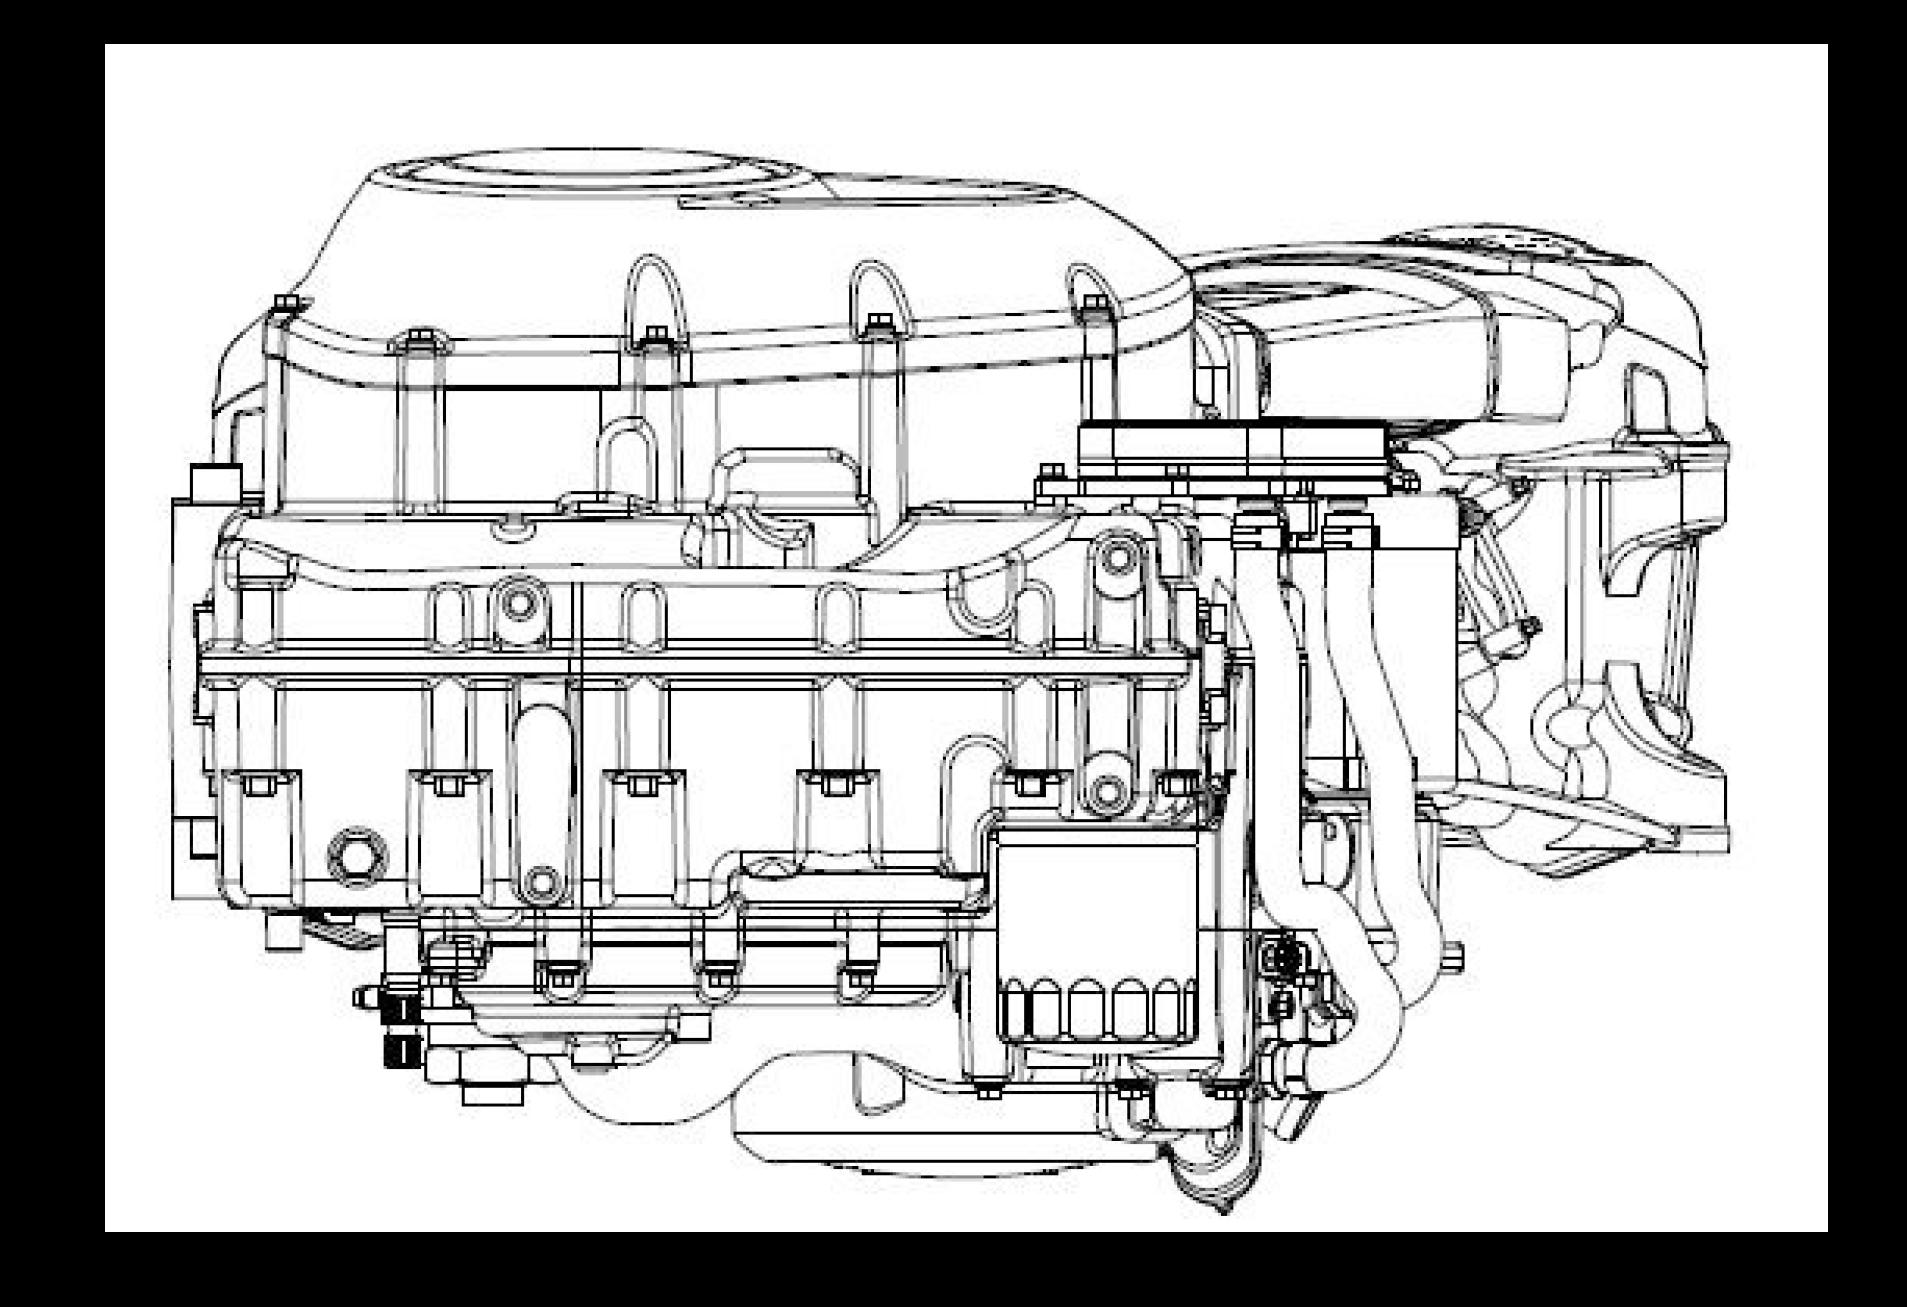 040419-harley-davidson-new-60-degree-v-twin-engine-0001-fig-6